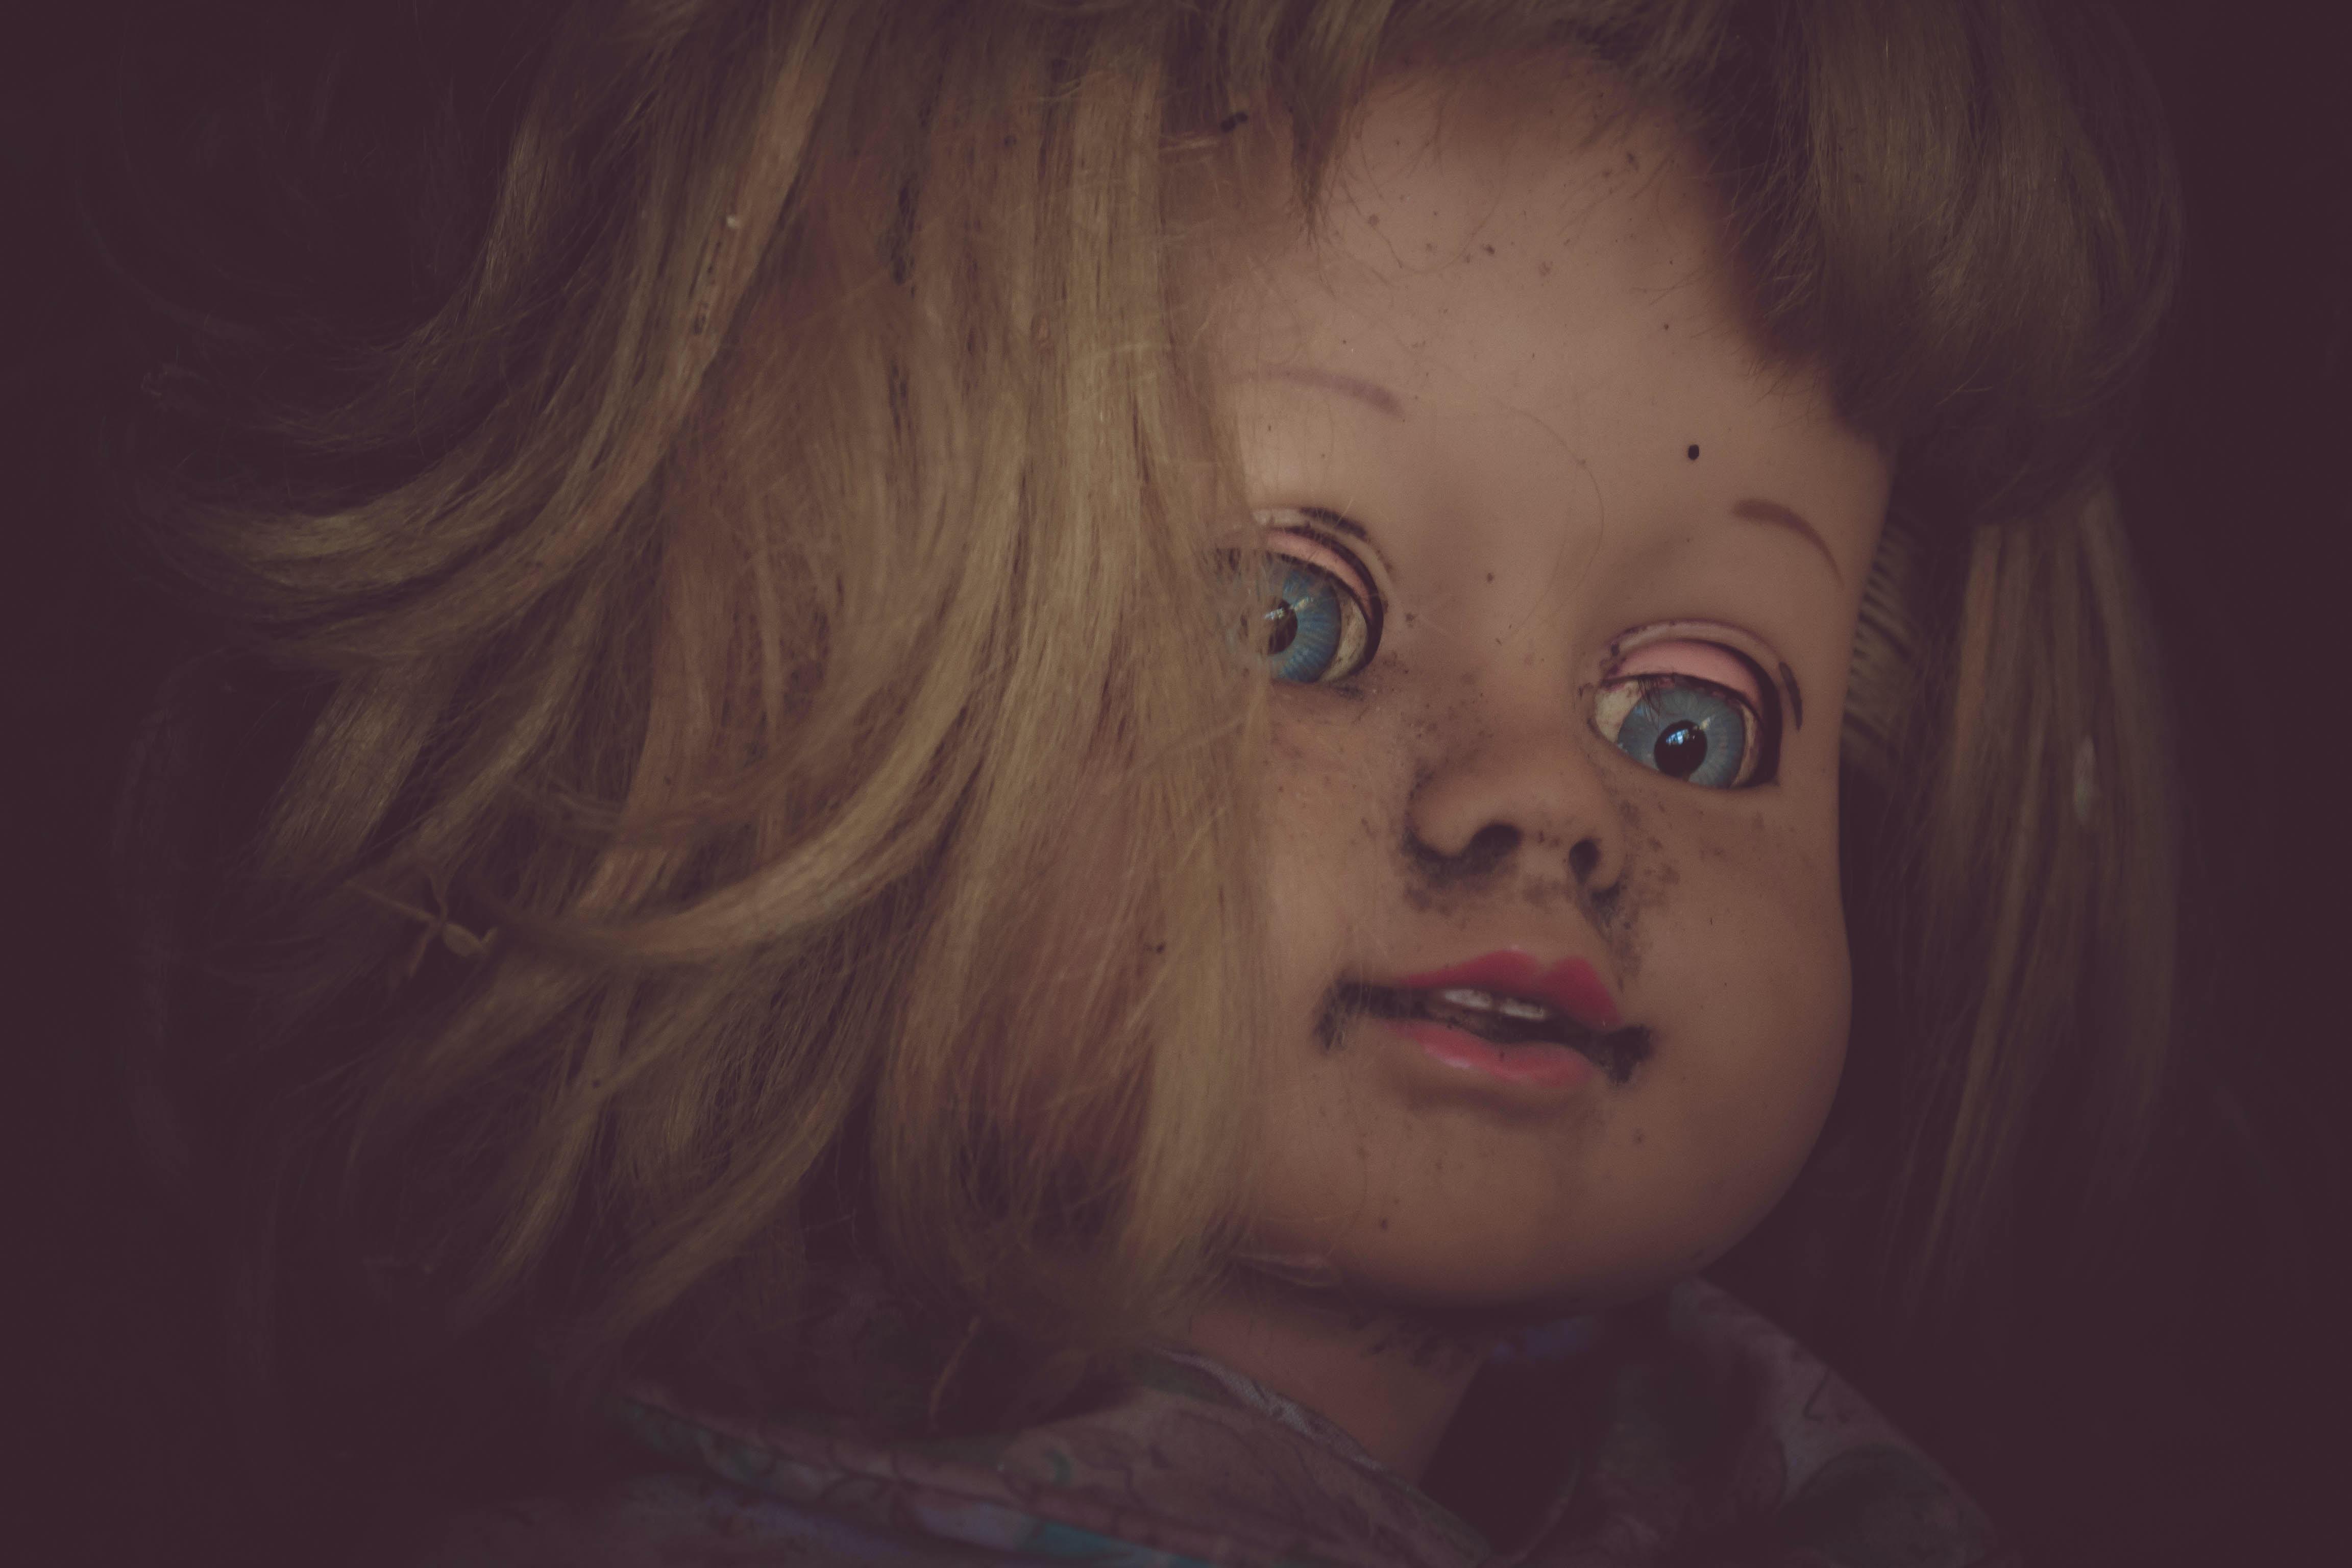 doll closeup photography